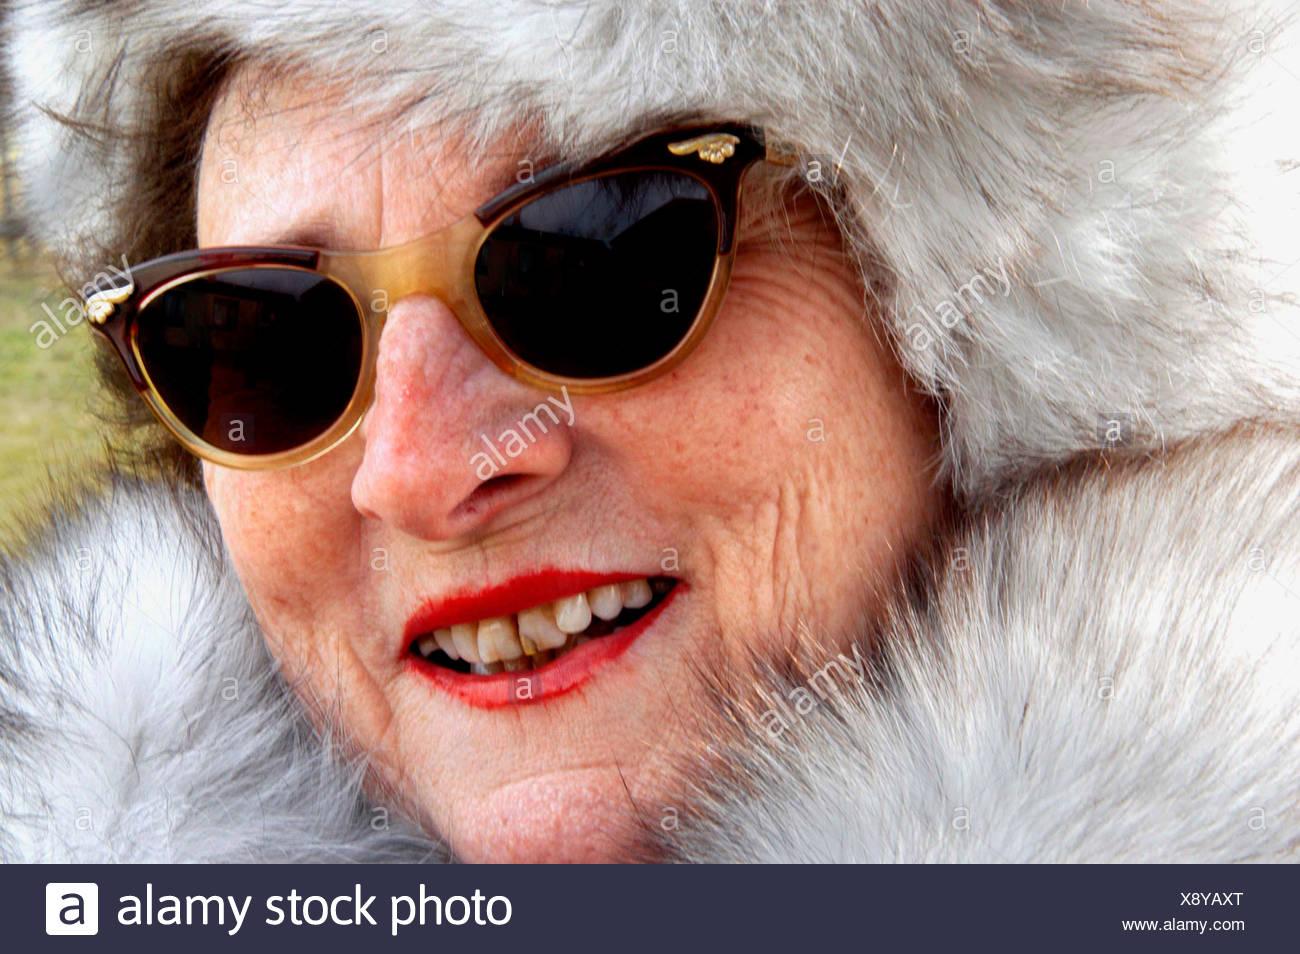 e037dfd60f Old woman in a fur coat with a fur hat and sunglasses Stock Photo ...